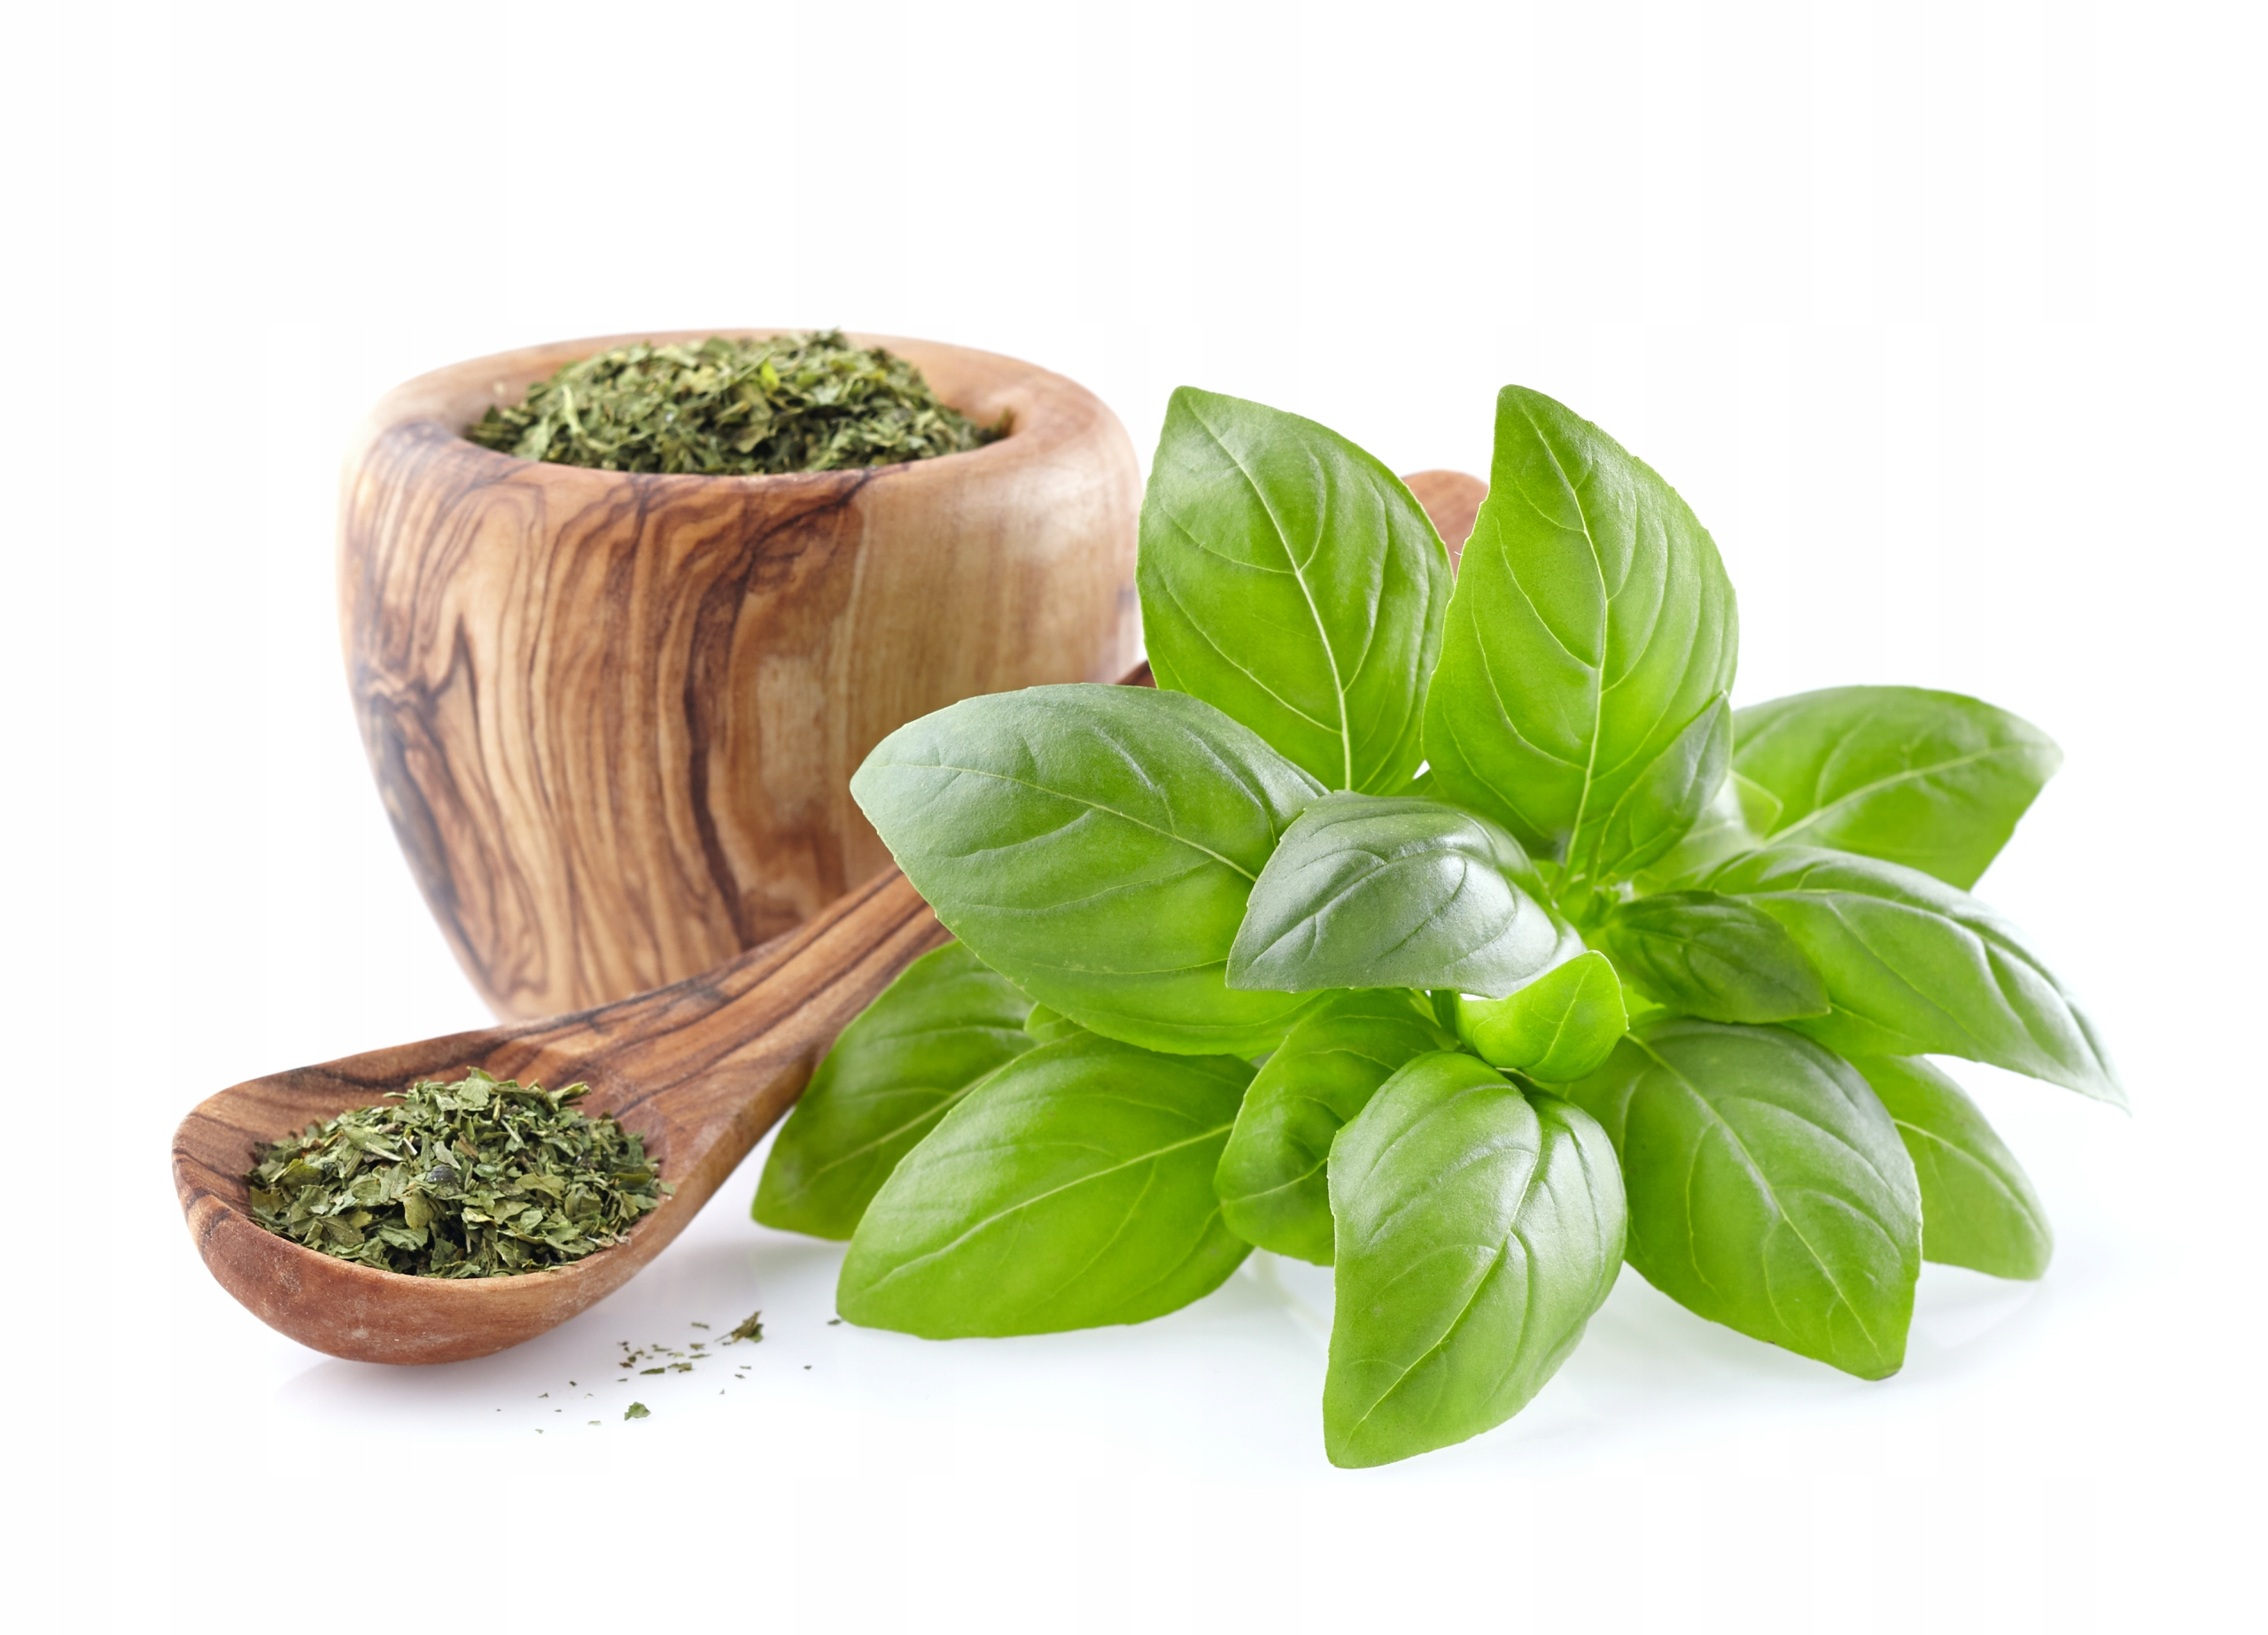 MORINGA LIŚĆ Olejodajna Najzdrowsza herbata 500g Marka Moringa Tea